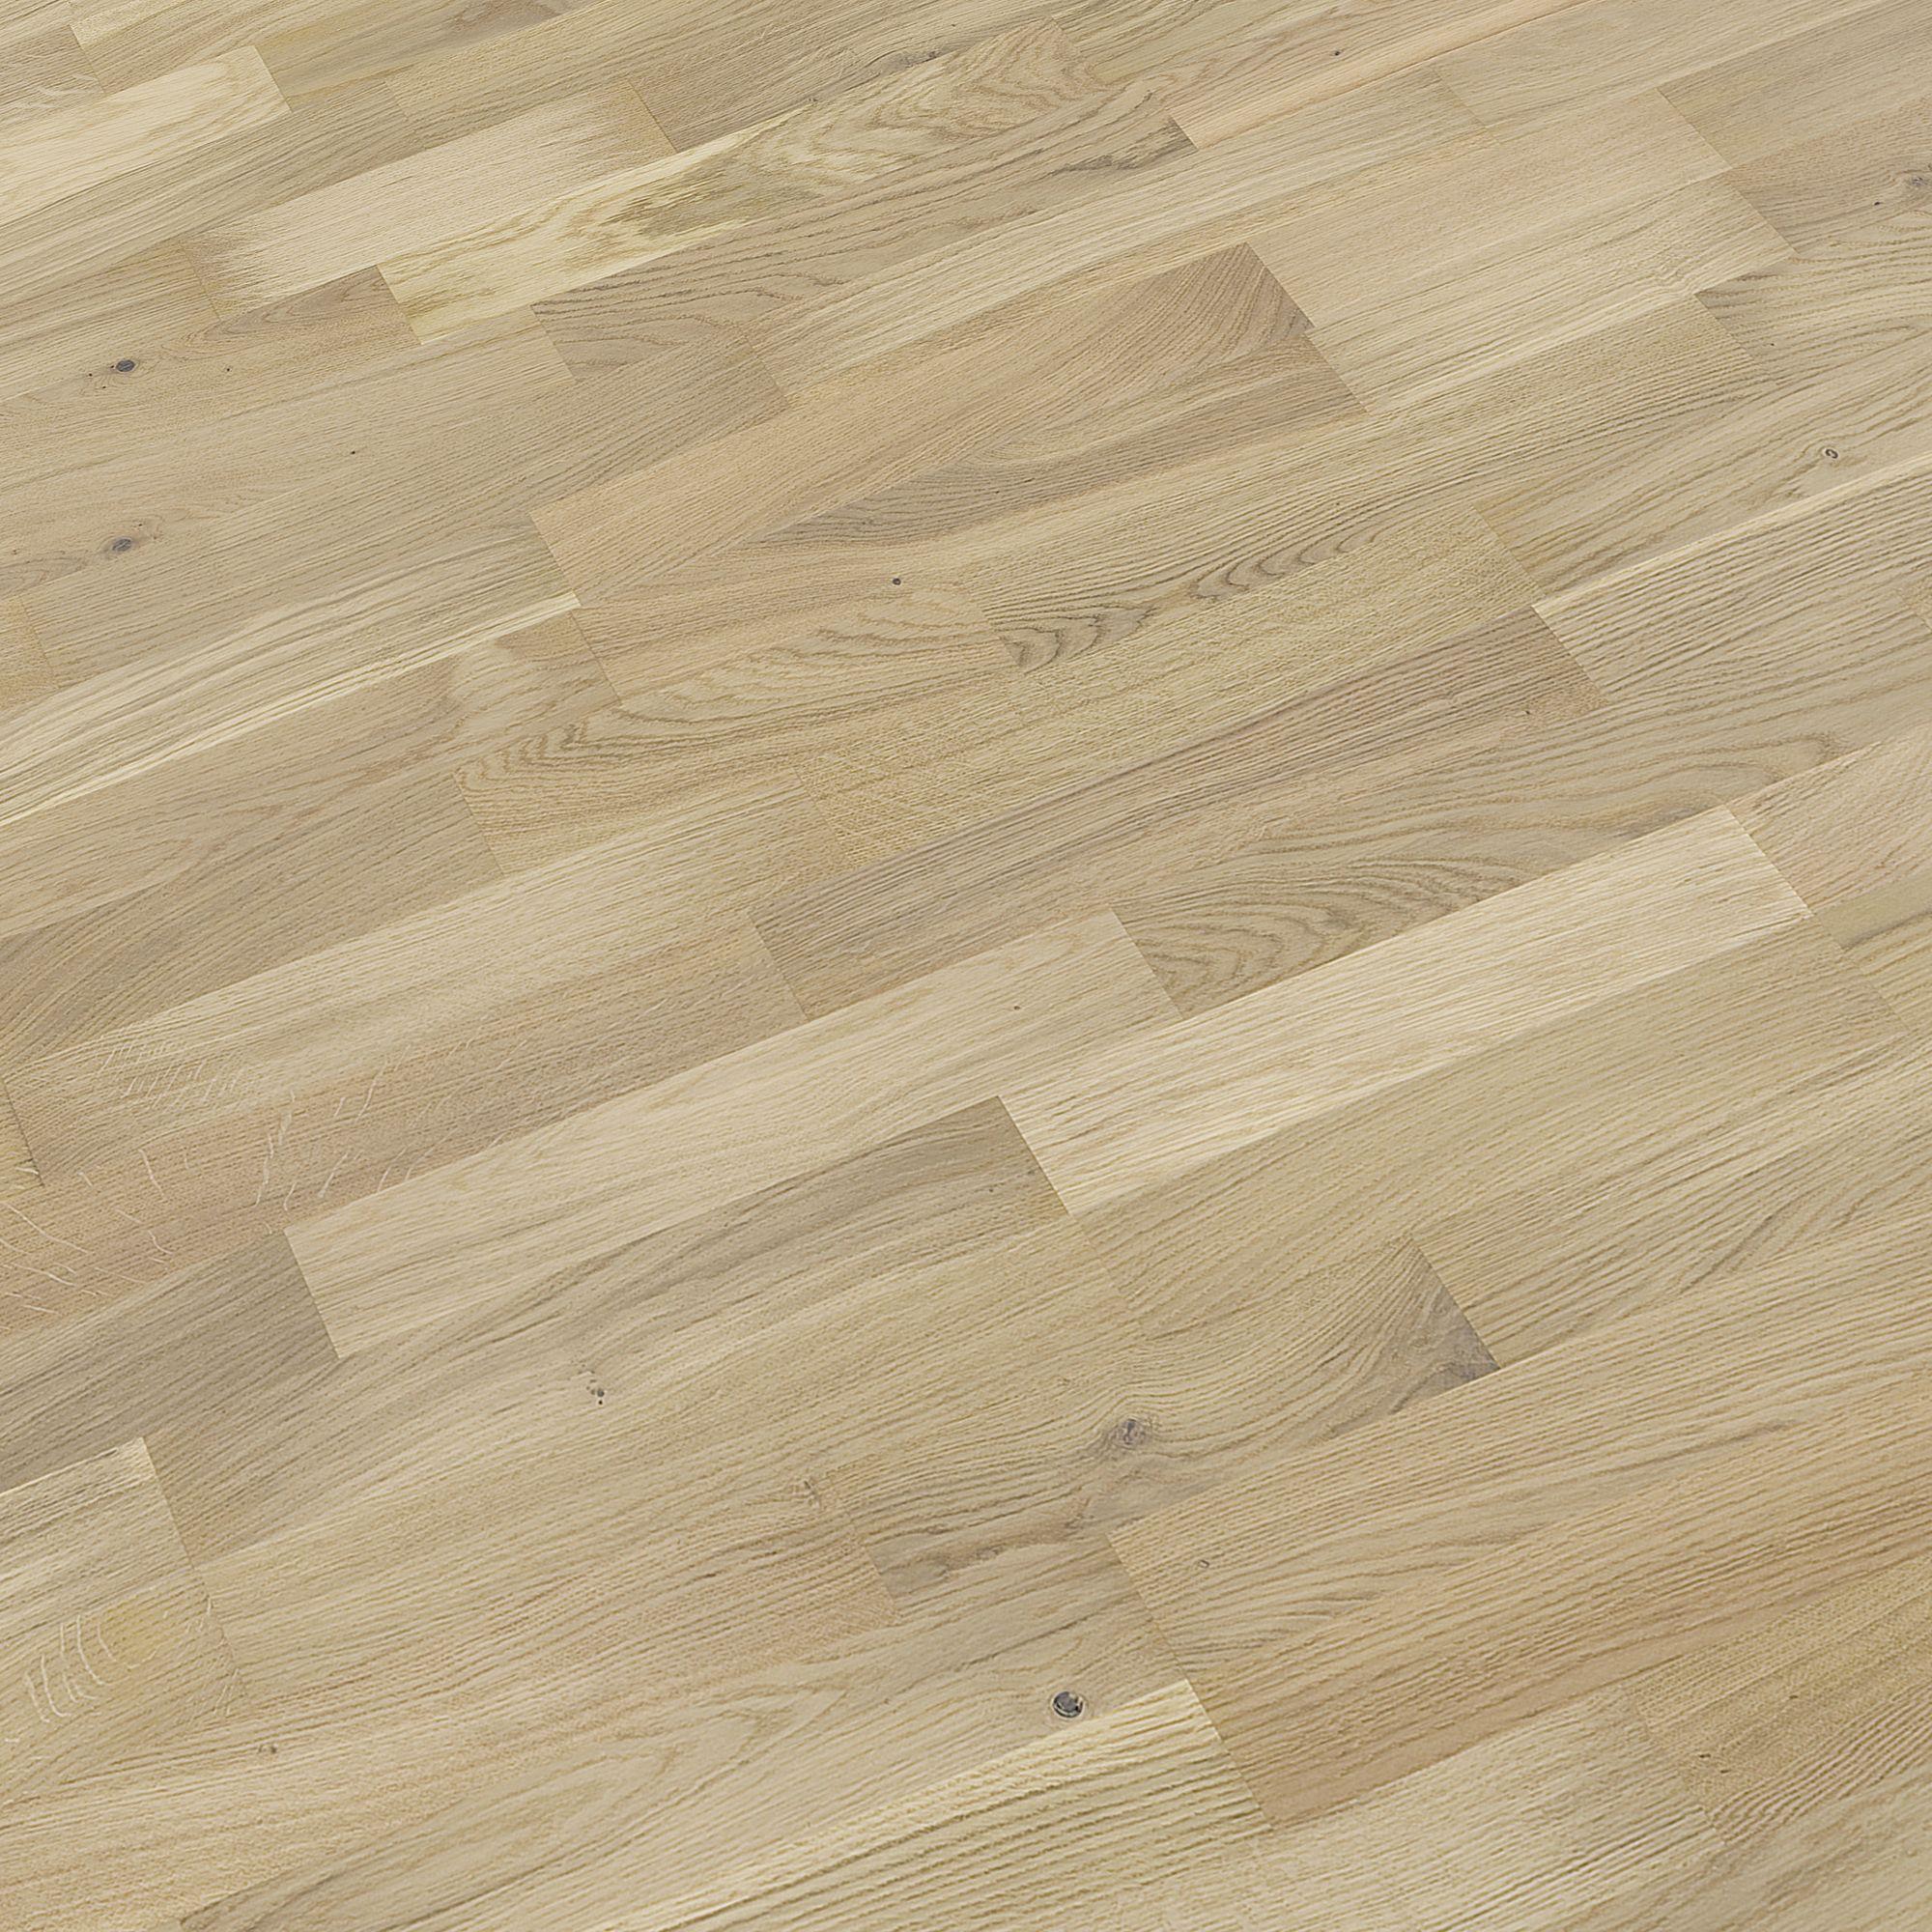 Bq Kitchen Laminate Flooring Bq White Oak Real Wood Top Layer Flooring Sample Departments